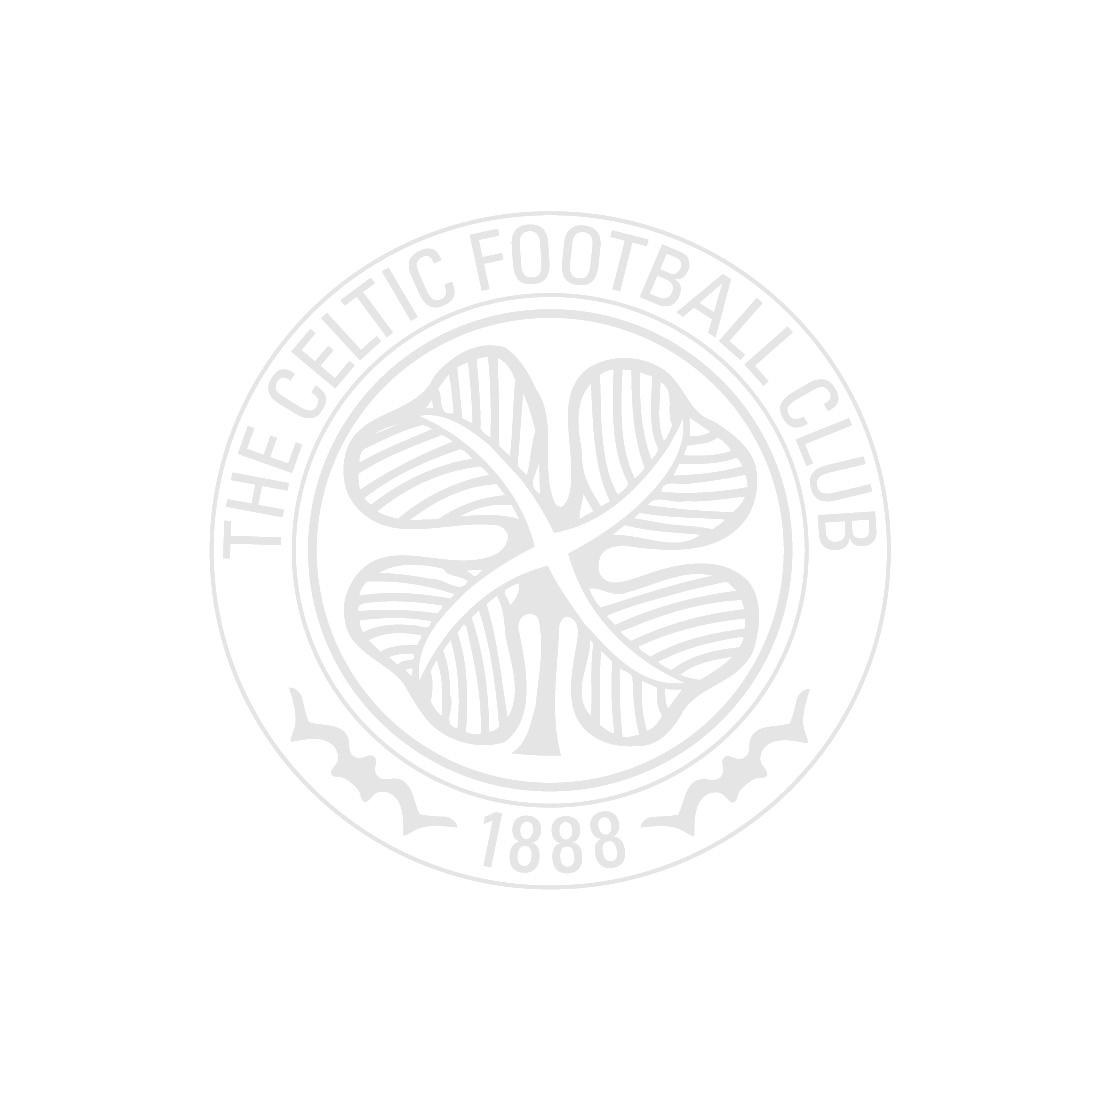 Celtic FC Raised Print T-shirt